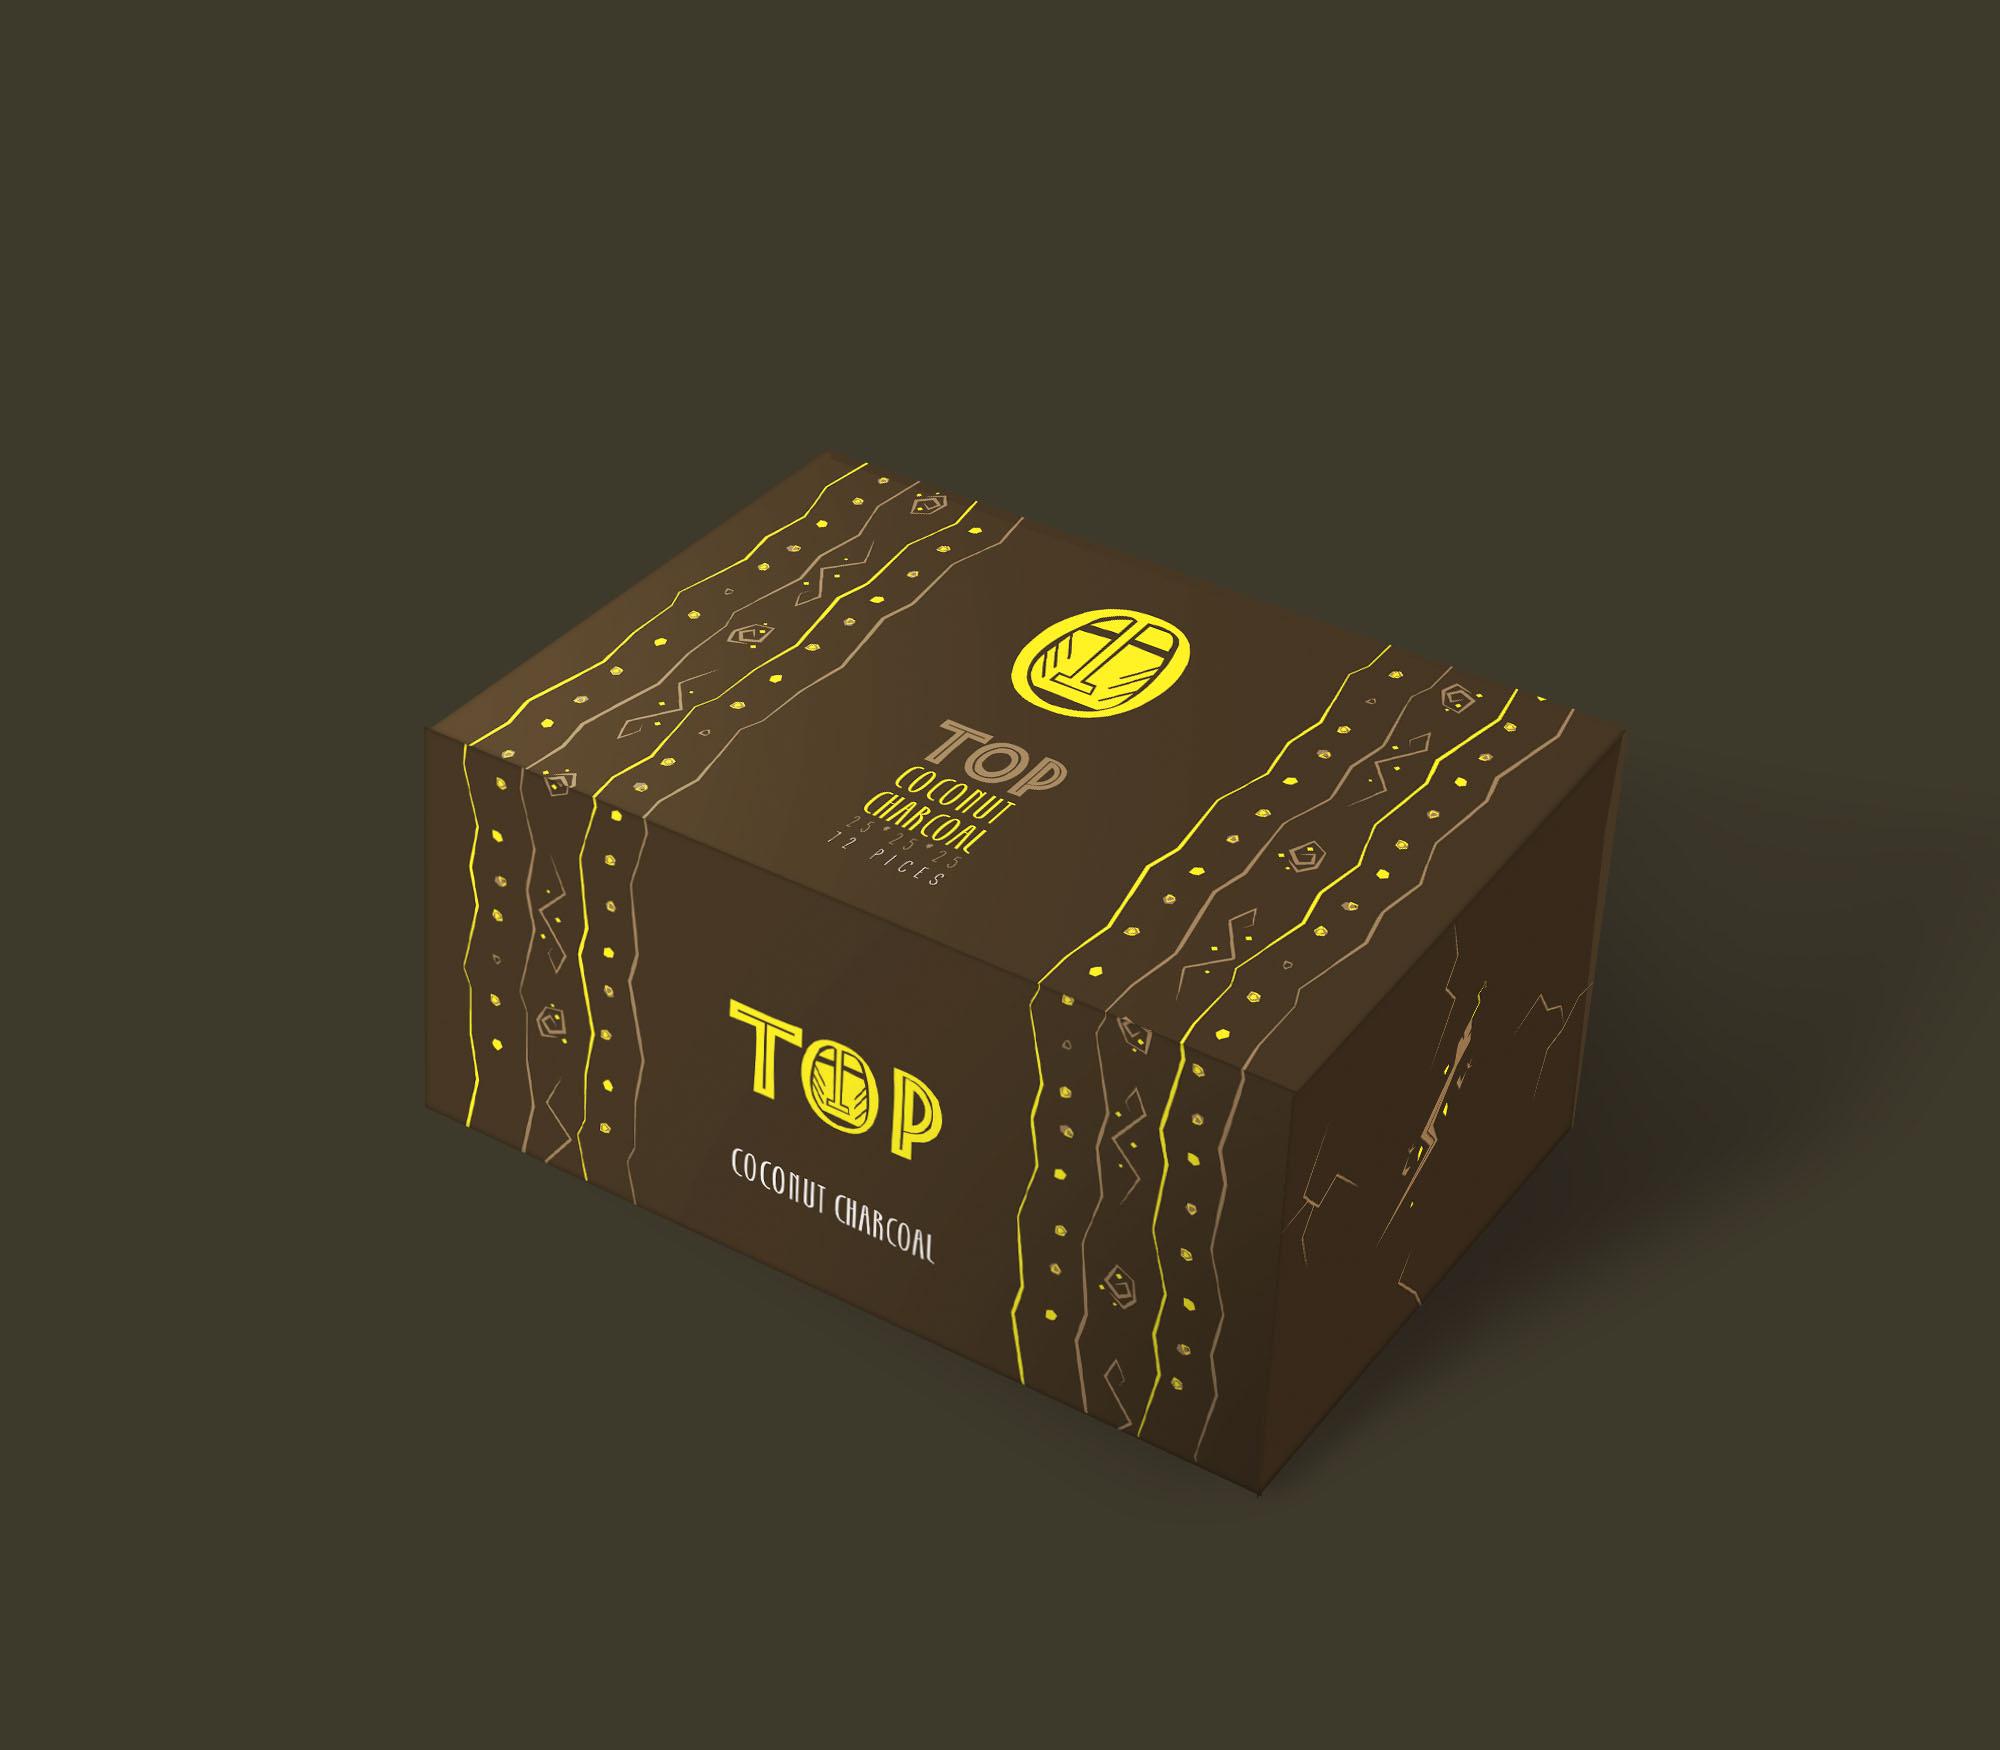 Разработка дизайна коробки, фирменного стиля, логотипа. фото f_4435c649538489be.jpg